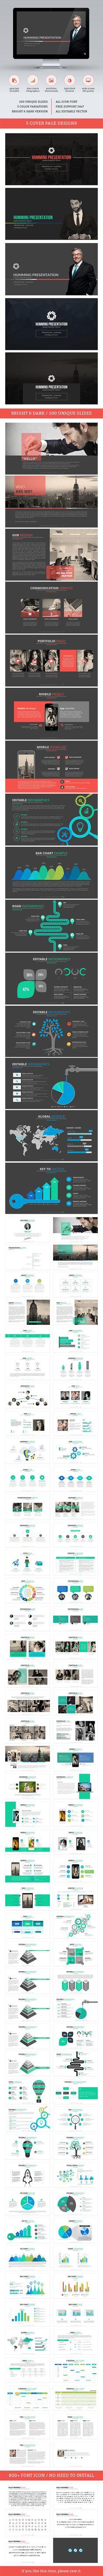 Humming PowerPoint Template #design #slides #presentation Download: http://graphicriver.net/item/humming-powerpoint/13132107?ref=ksioks